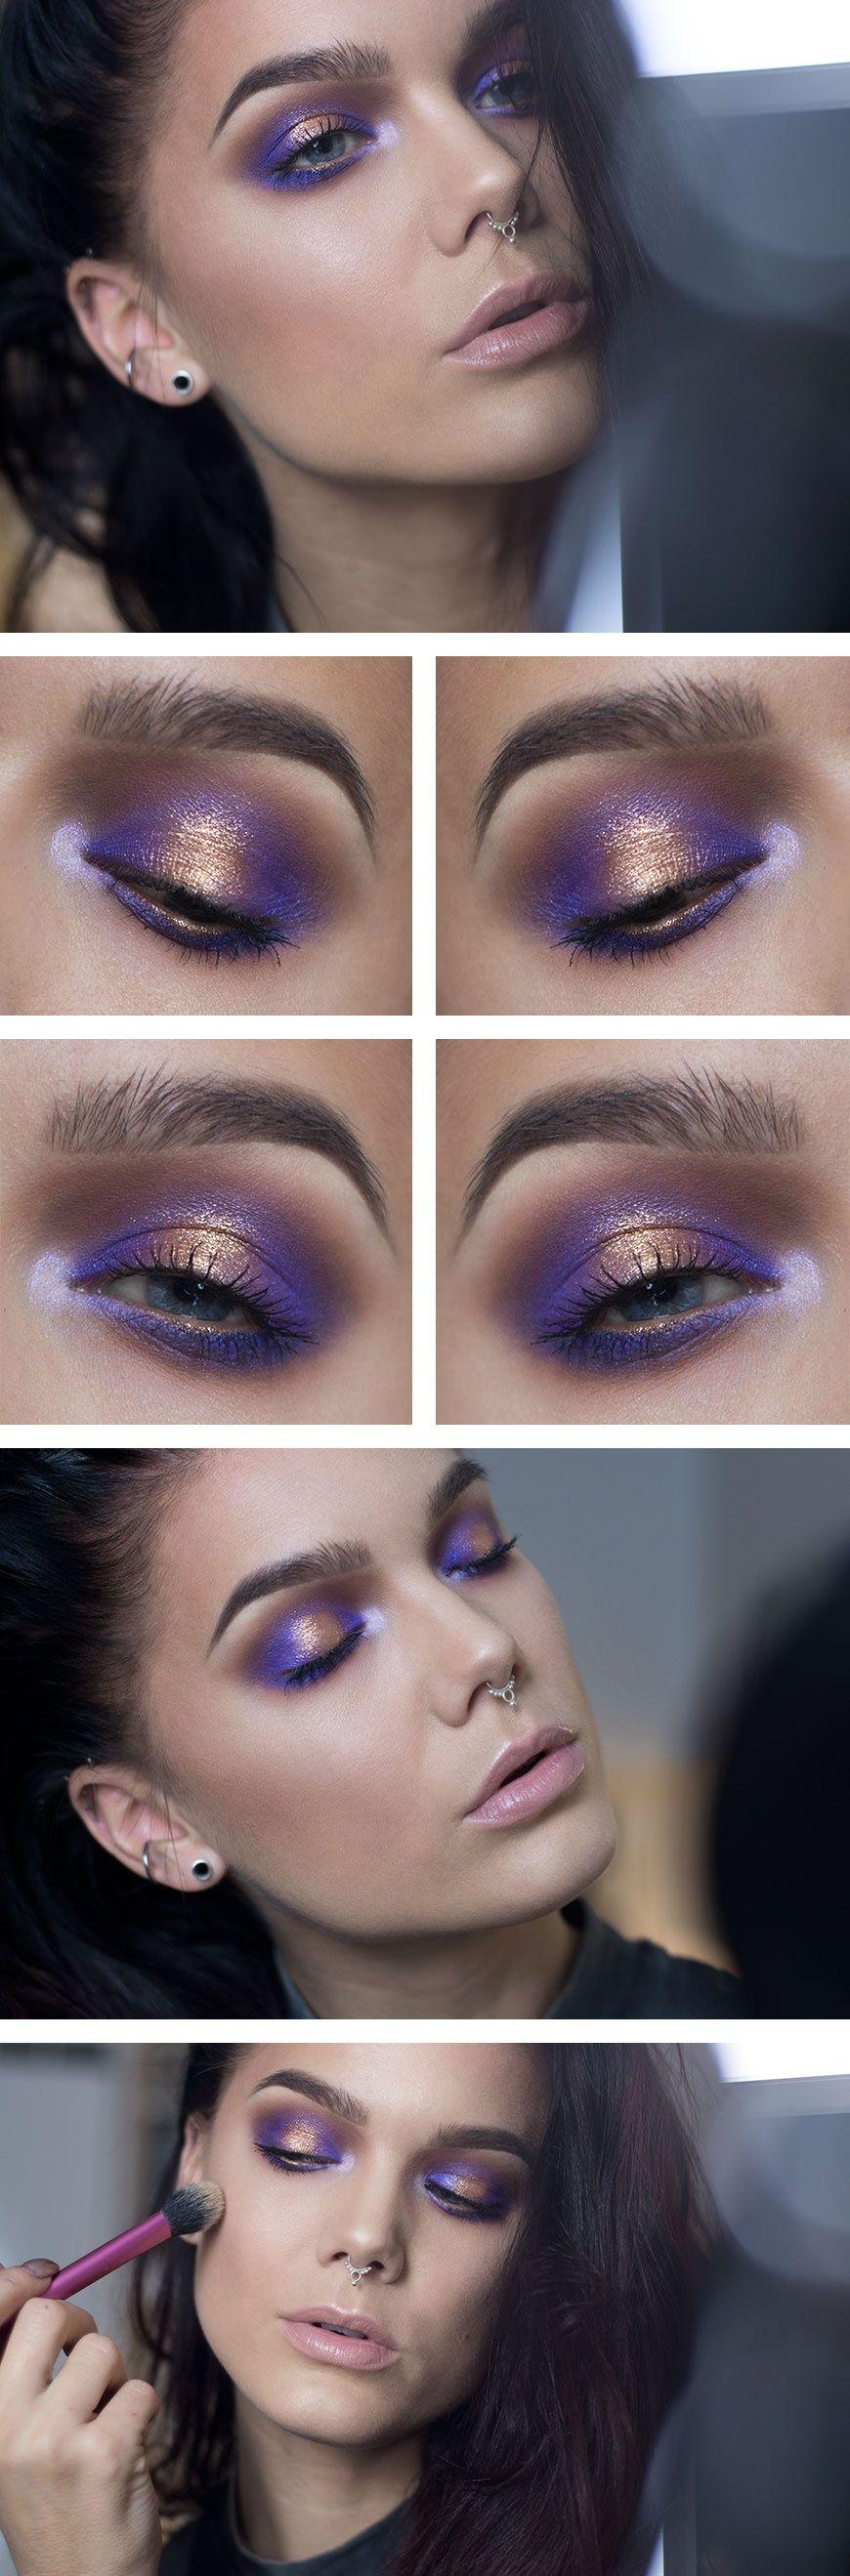 Todays look – High shine purple & gold